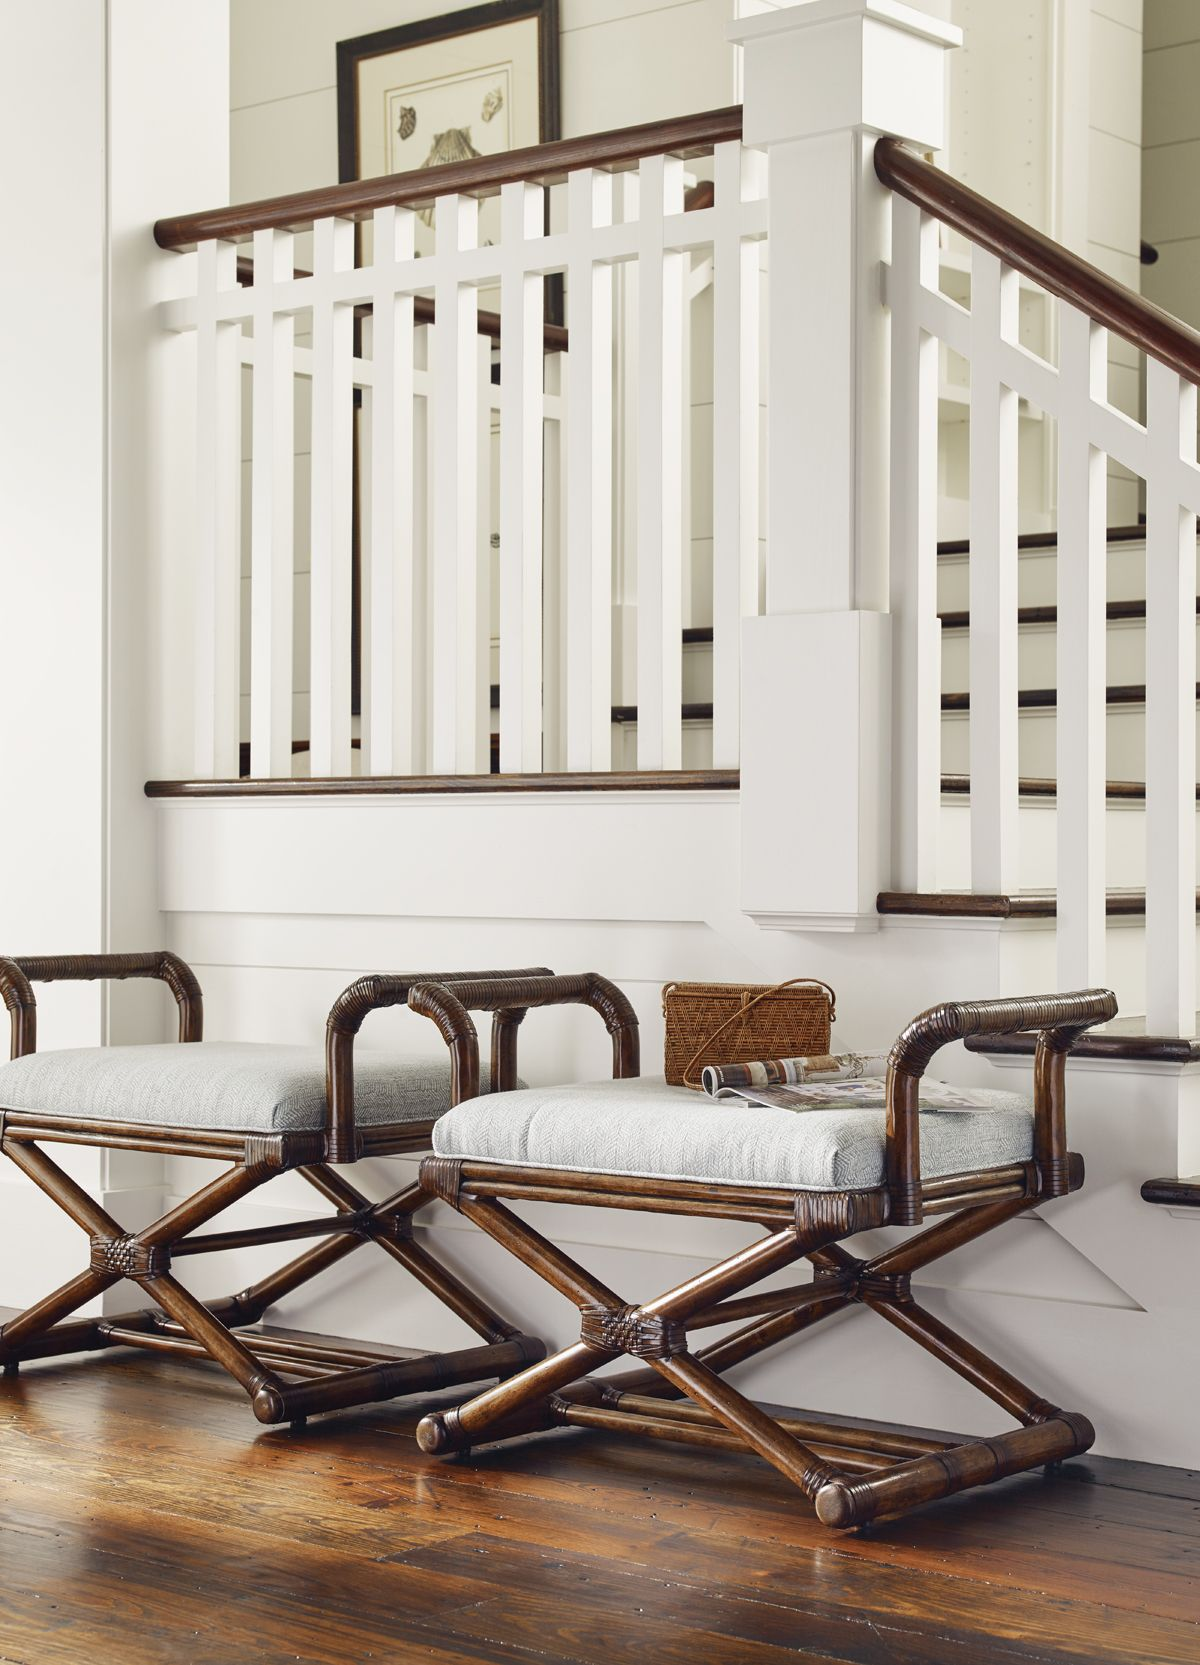 Bali Hai Echo Beach Bench | Coastal Benches | Tommy Bahama Furniture ...